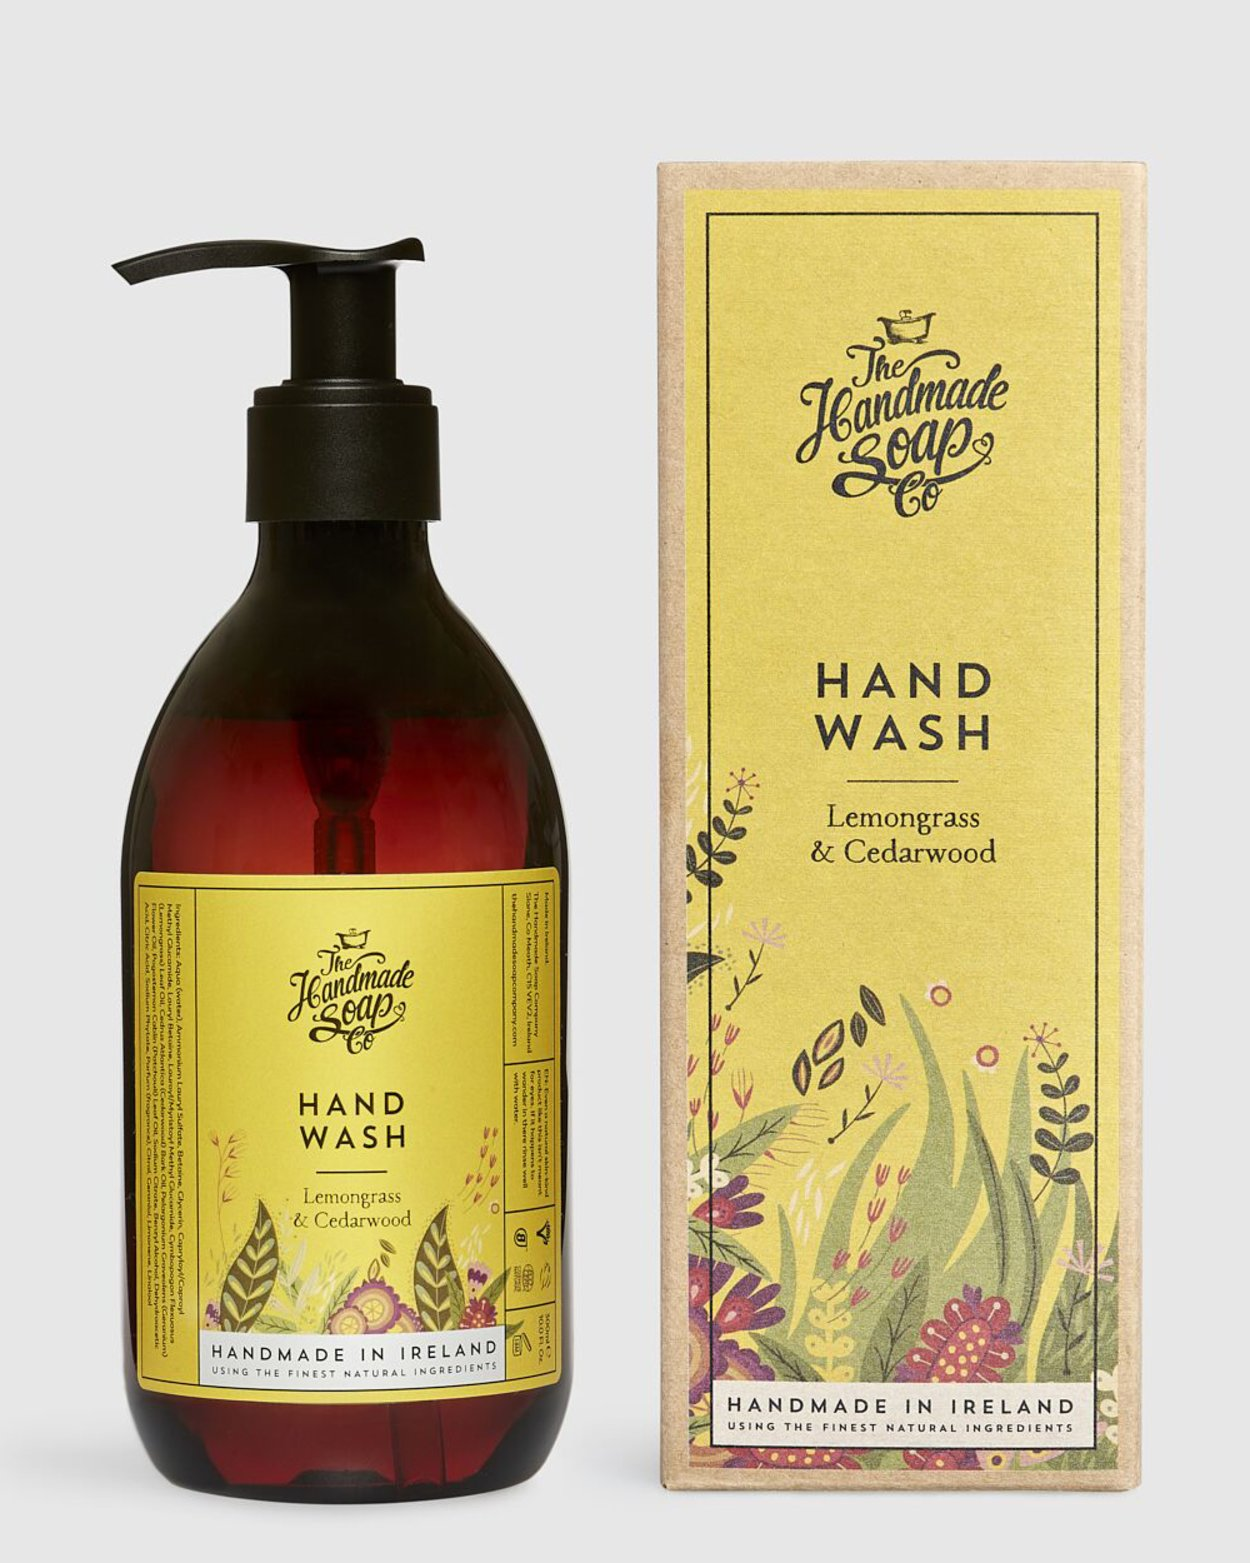 Lemongrass & Cedarwood Hand Wash